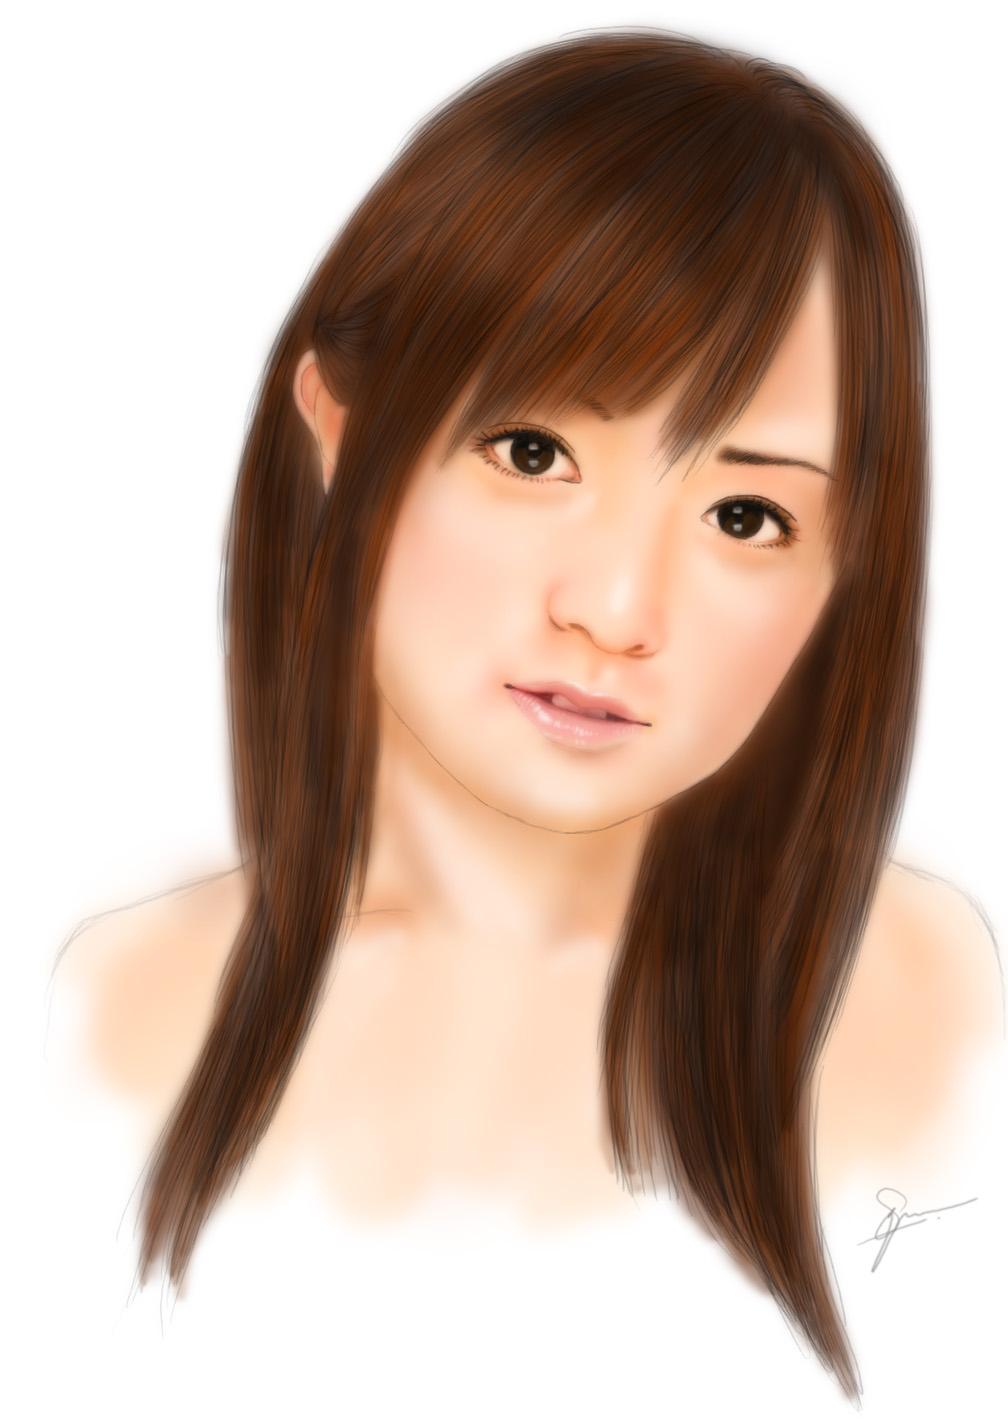 Konno Asami!!! August 19, 2009